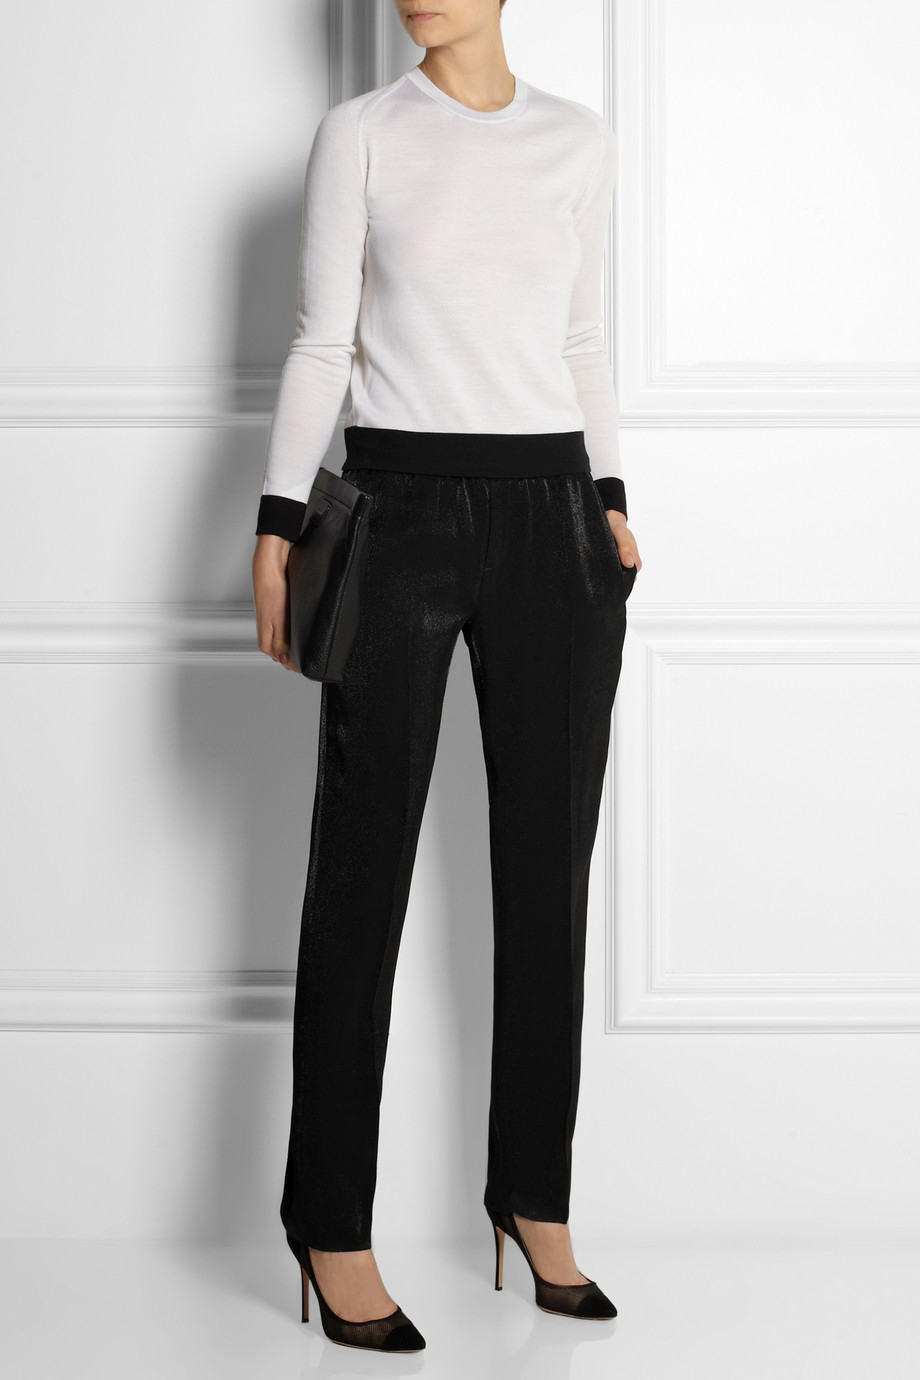 Lyst Calvin Klein Satin Crepe Tapered Pants In Black